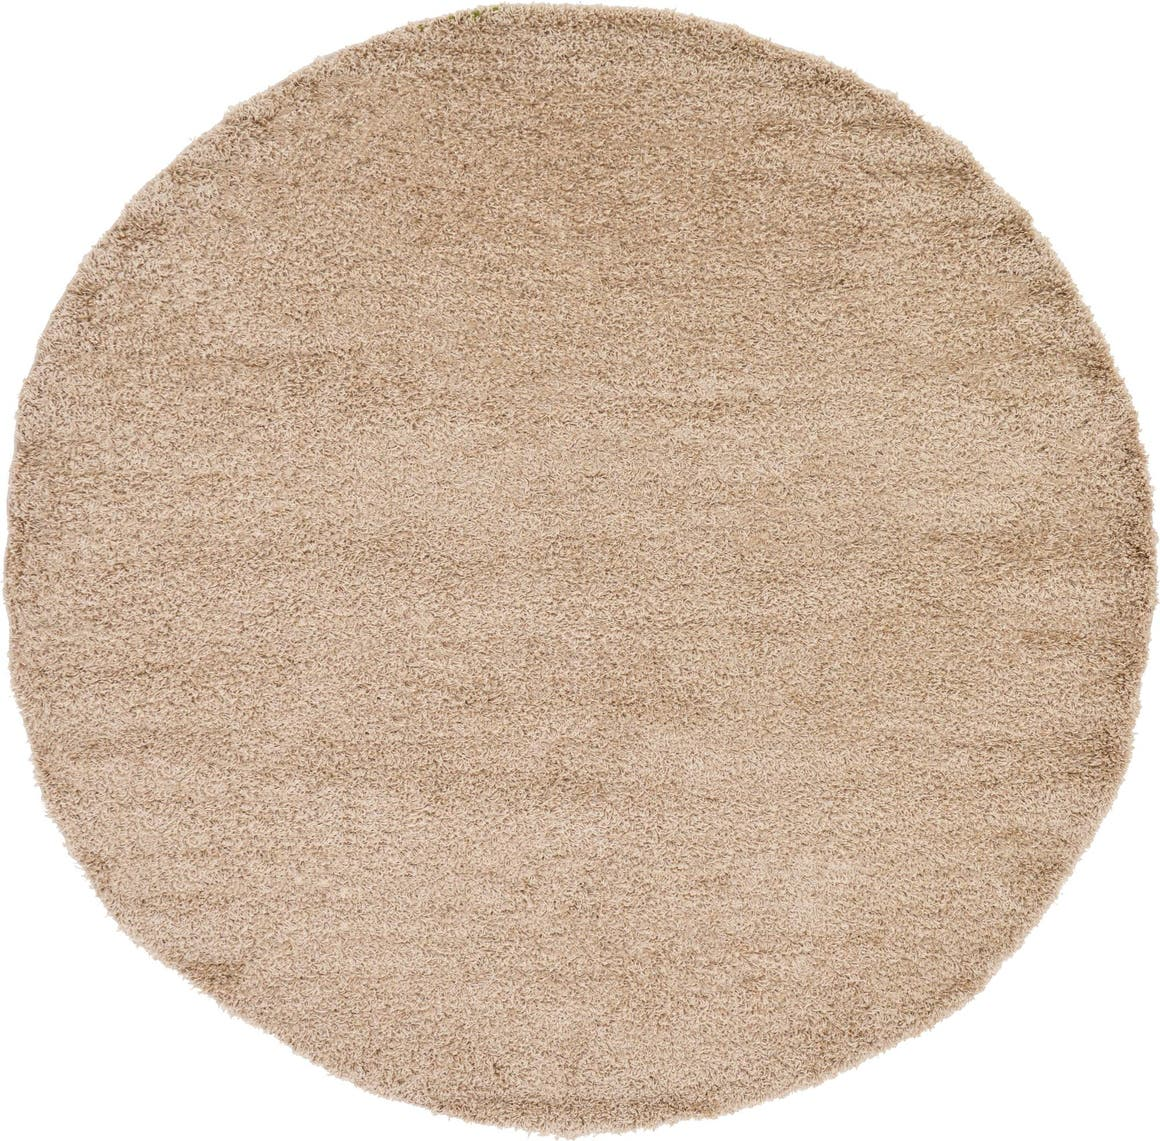 8' x 8' Solid Shag Round Rug main image